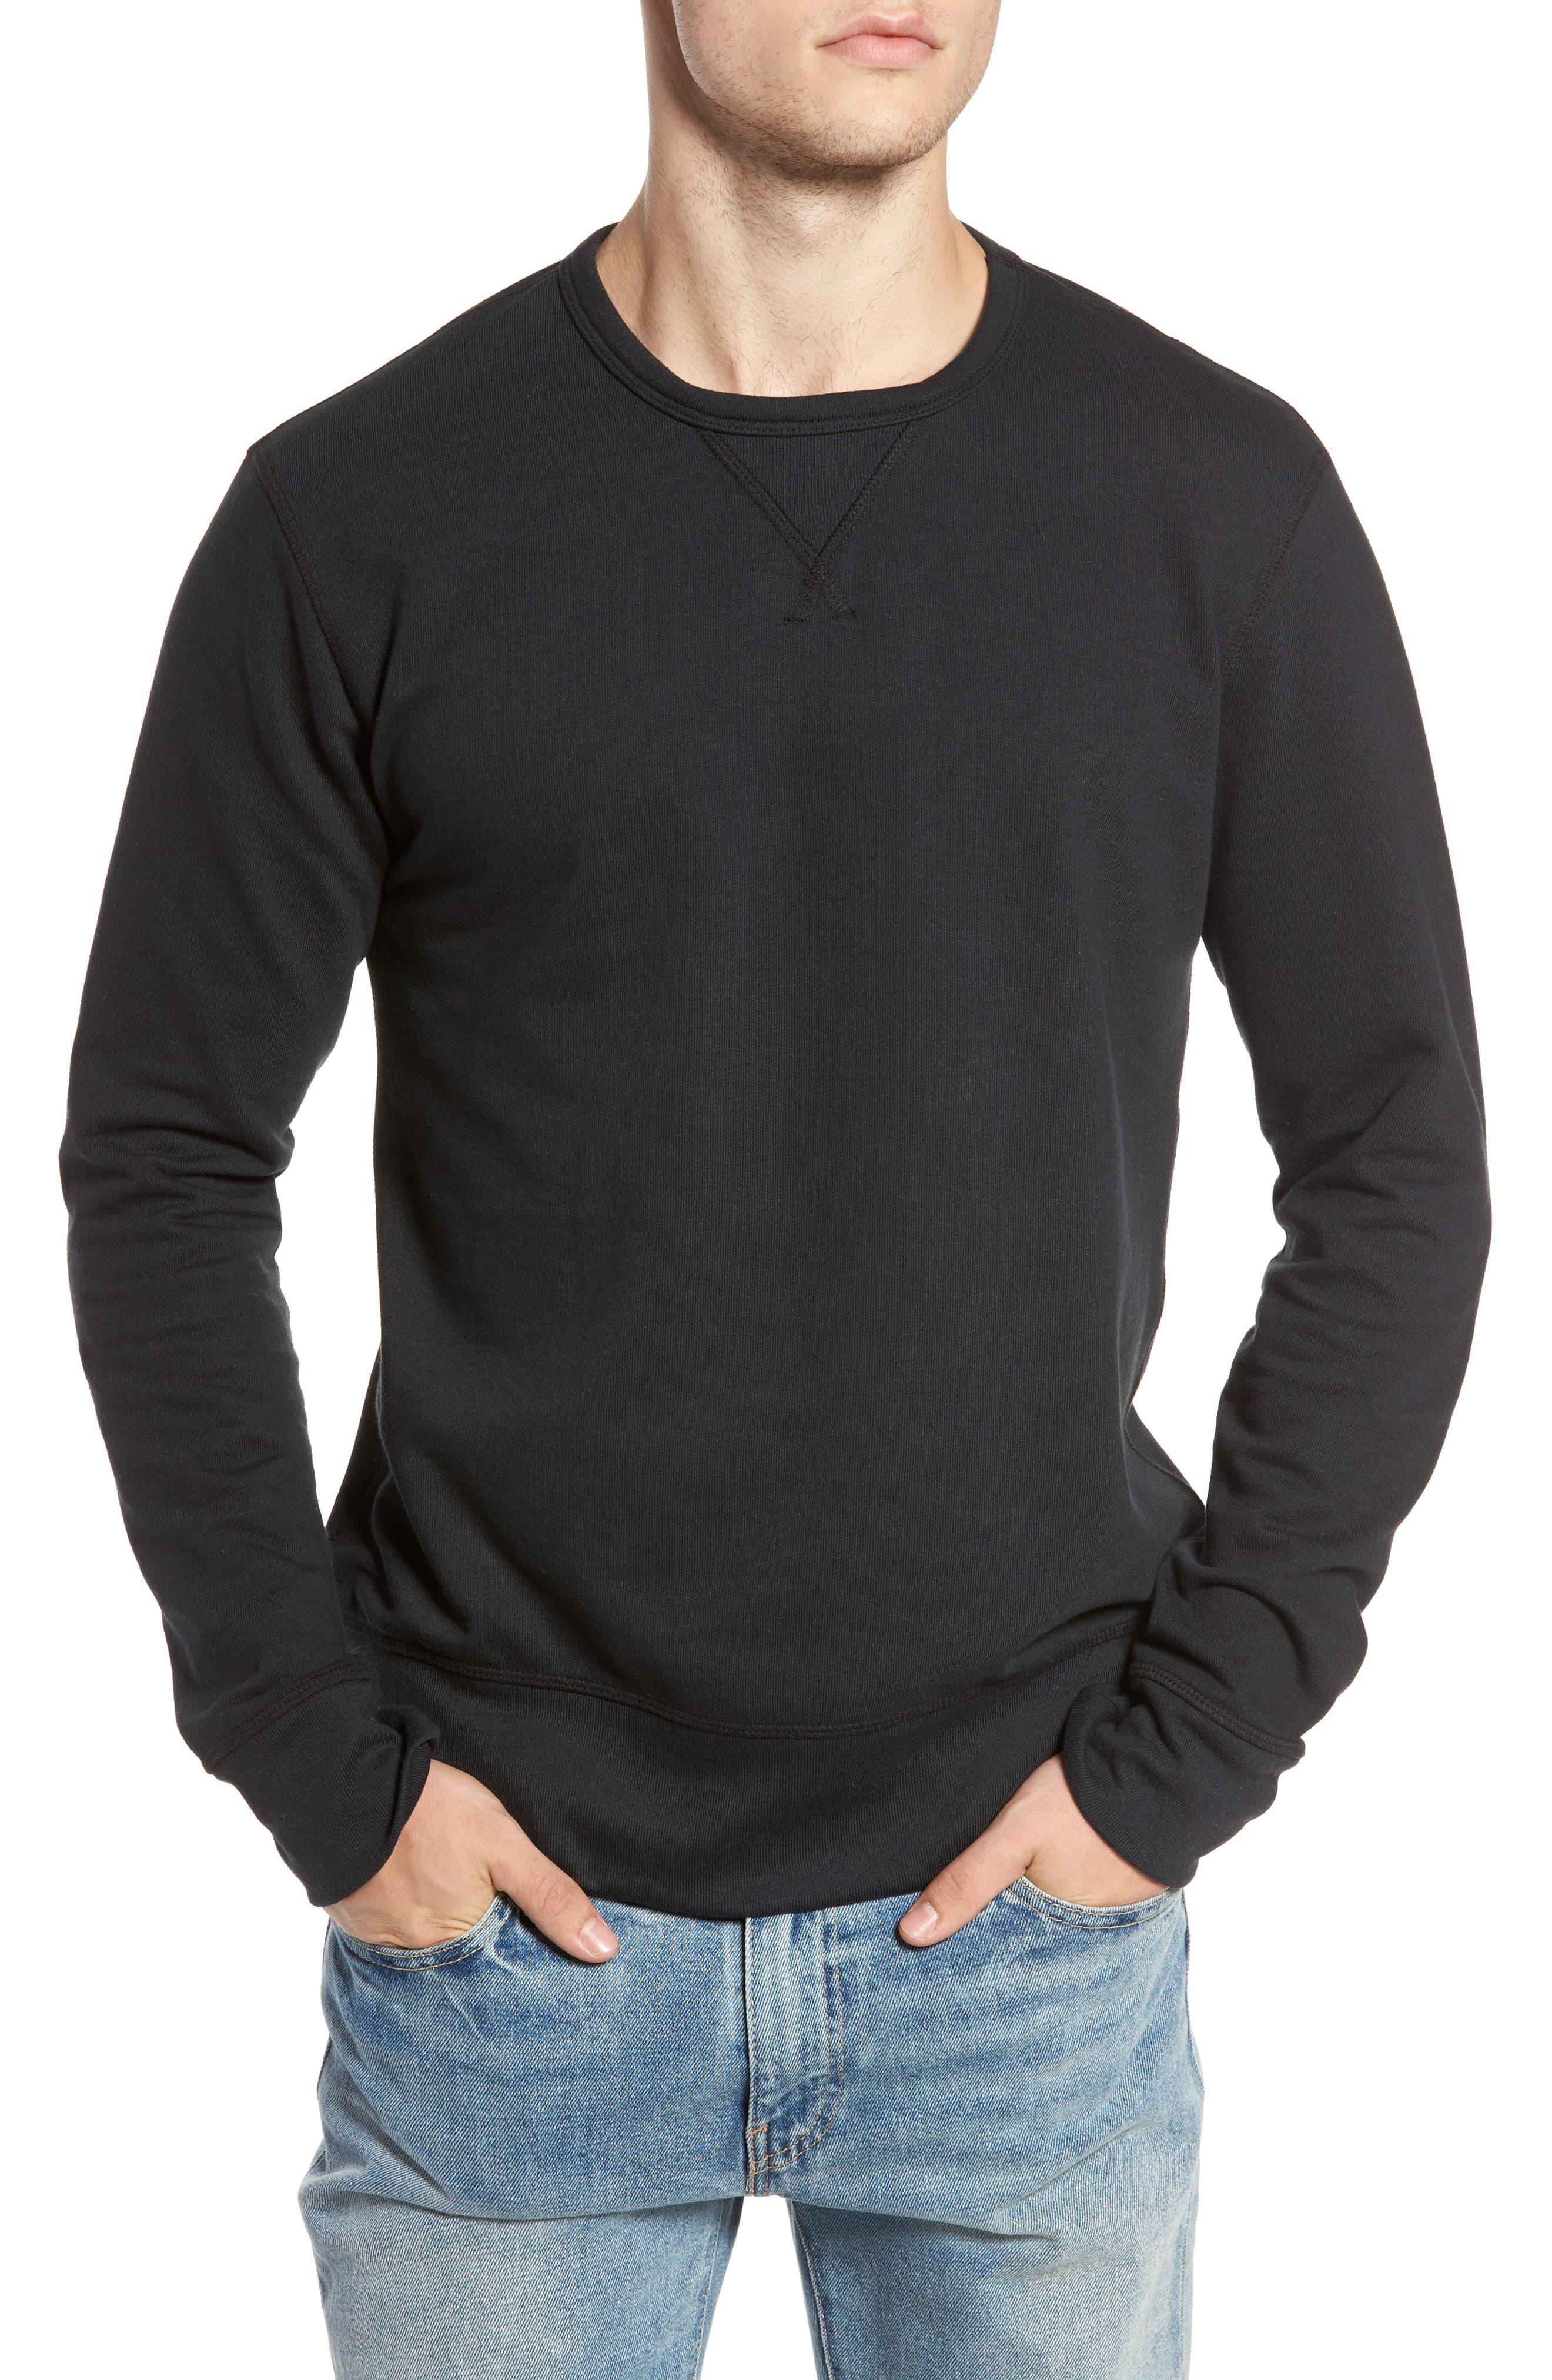 B-Side Reversible Crewneck Sweatshirt,                         Main,                         color, 001